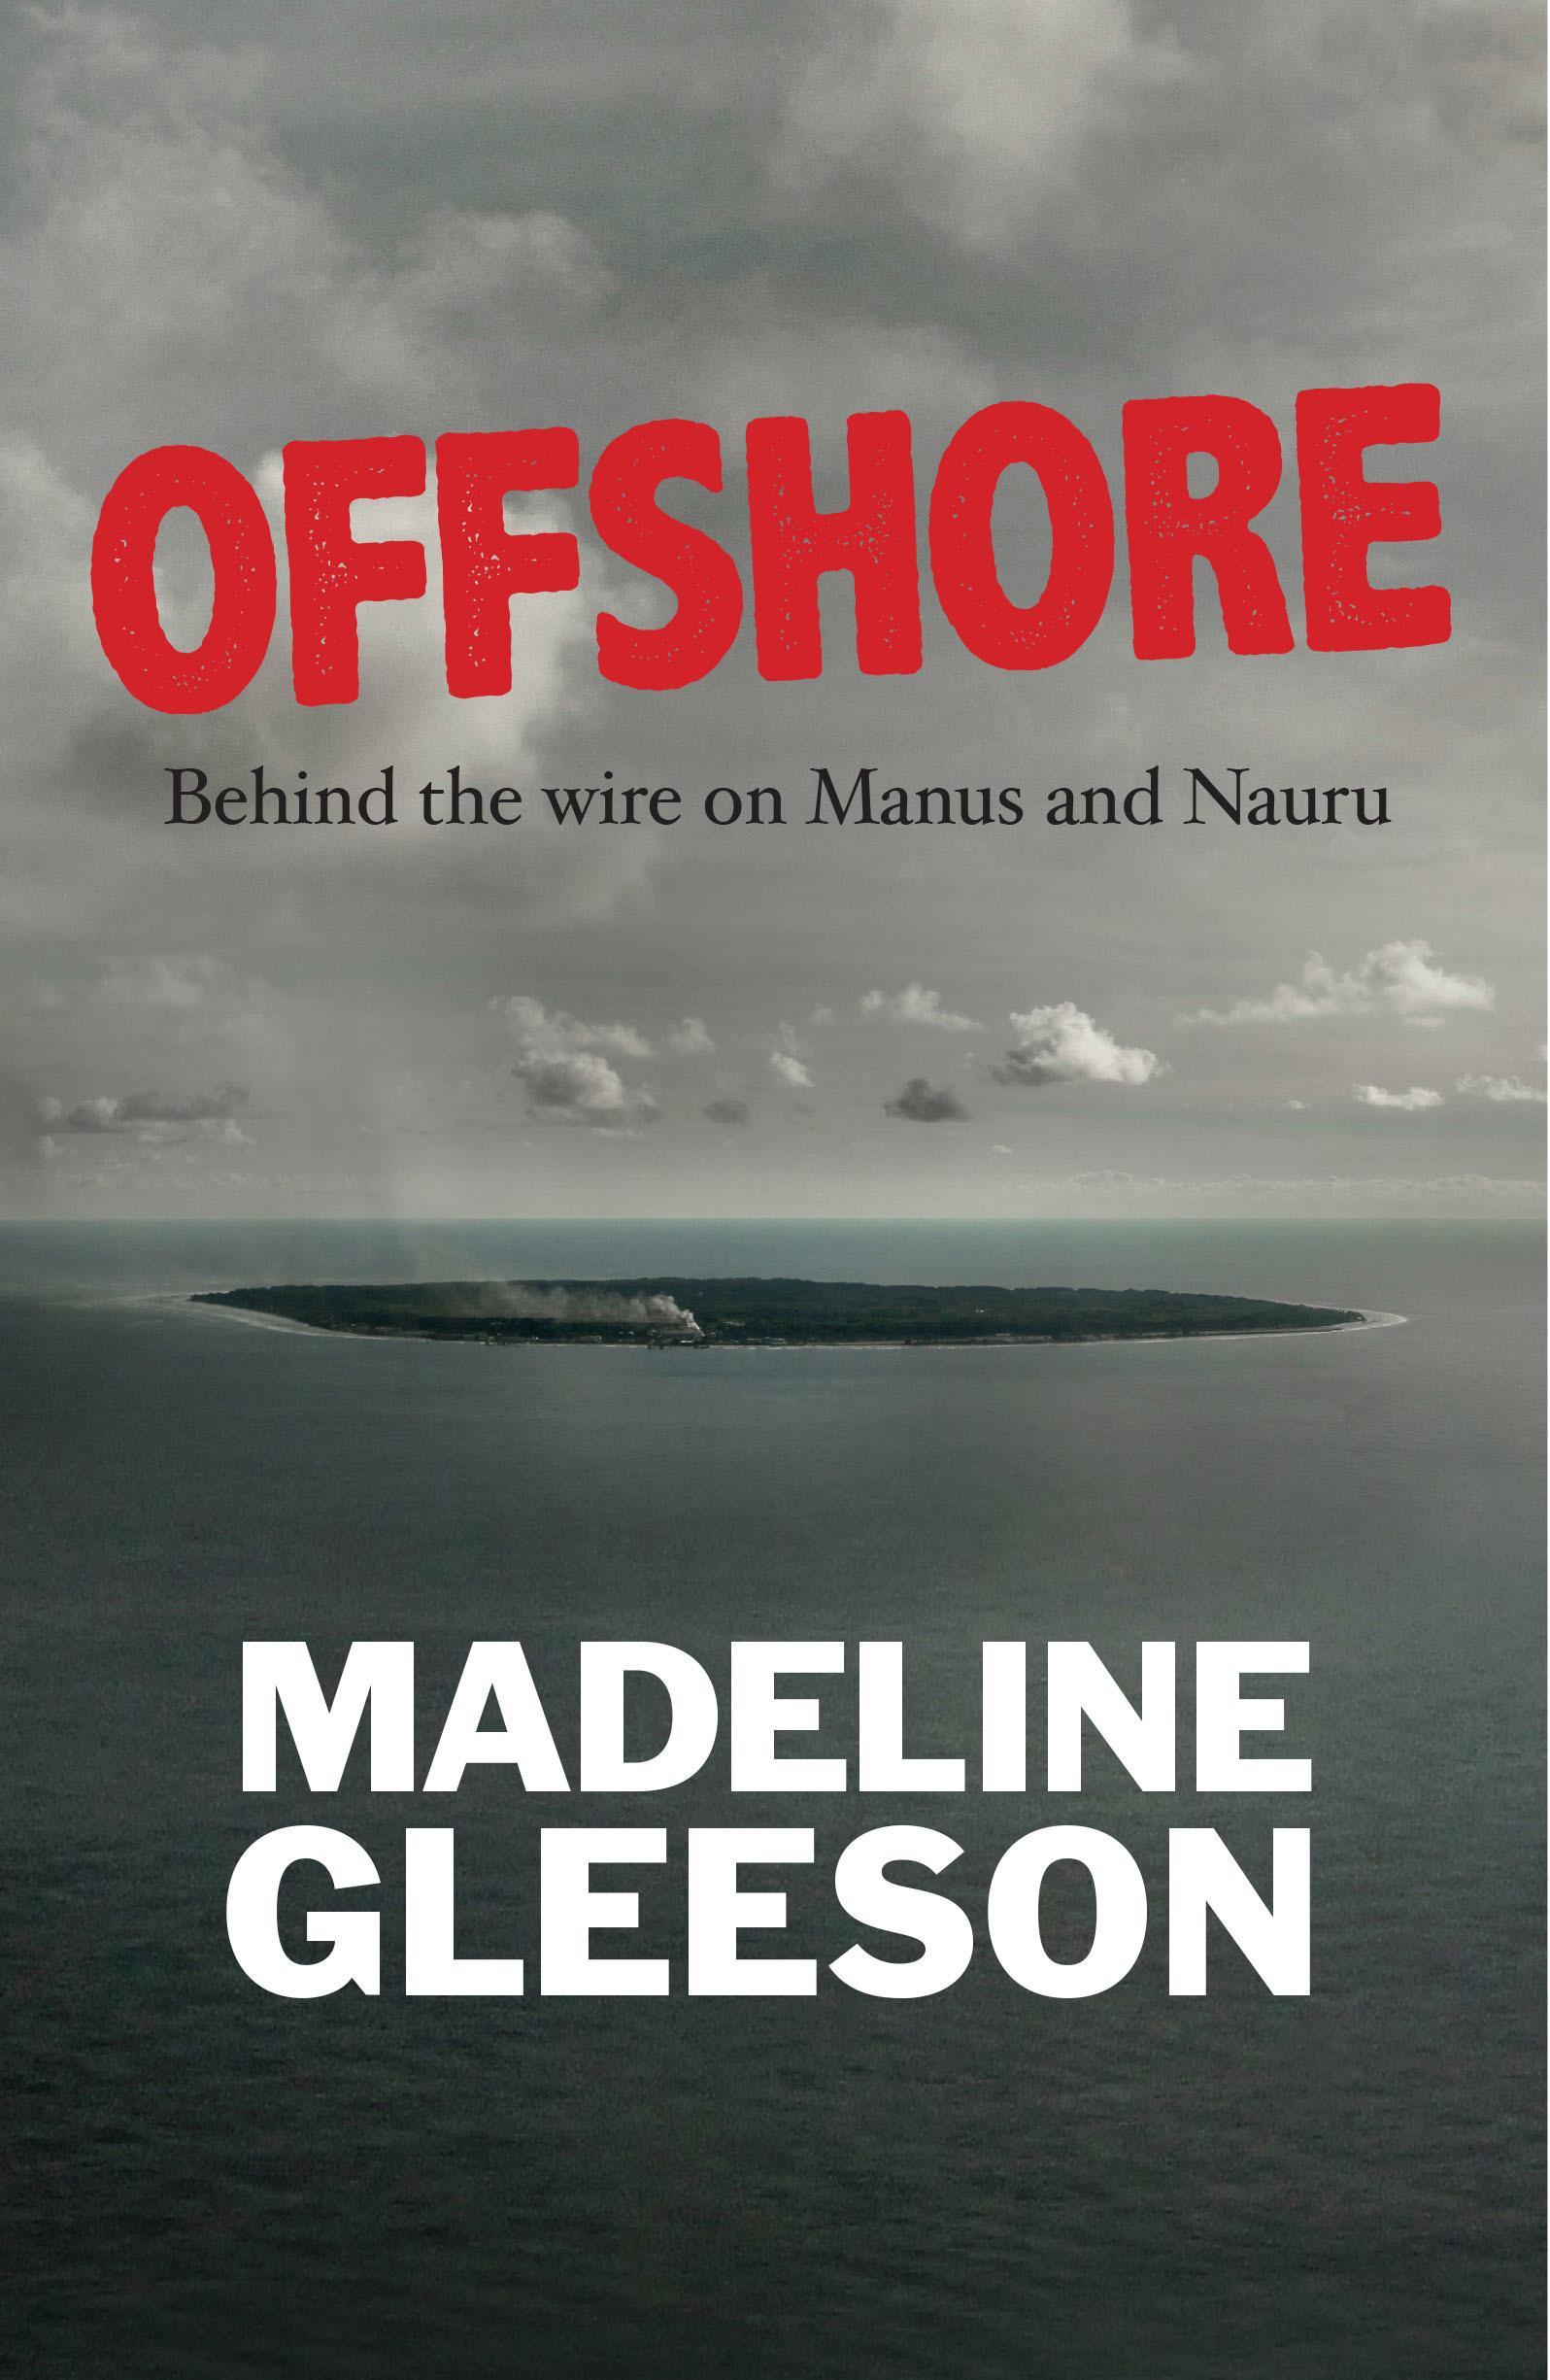 Offshore: Behind the wire on ManusandNauru